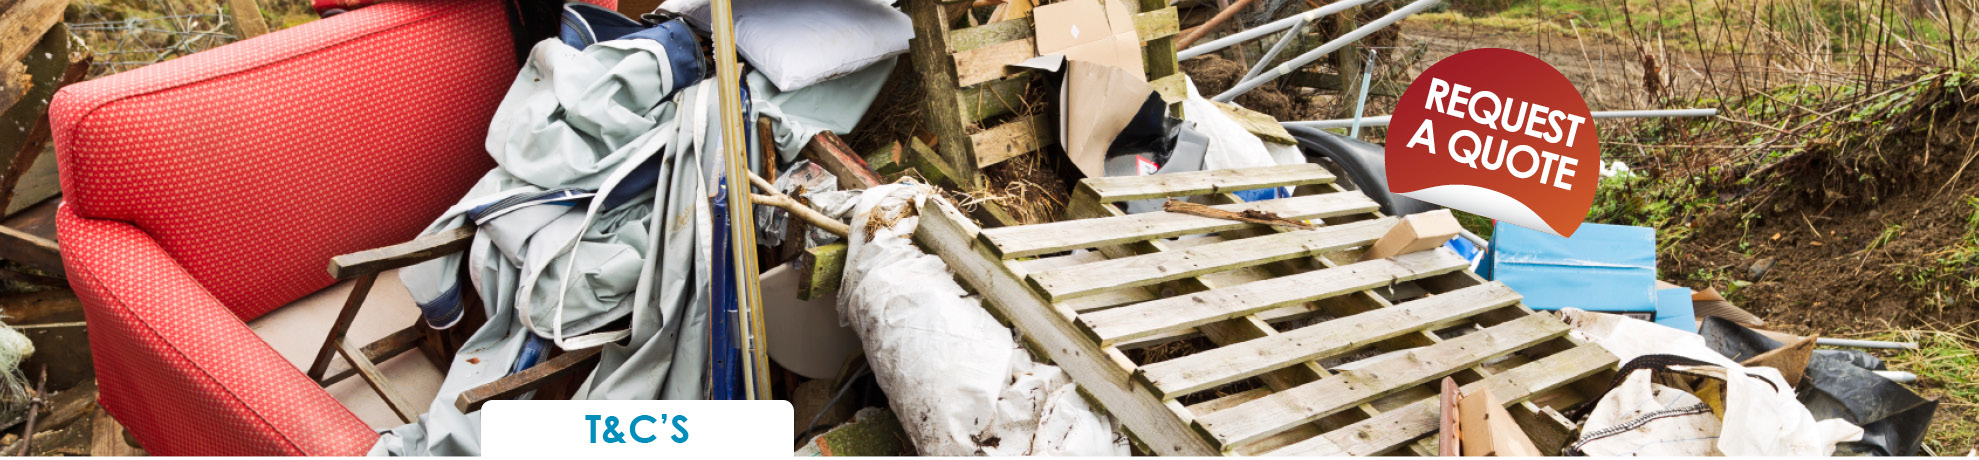 rubbsih removal, hoarders, trailer skip bins